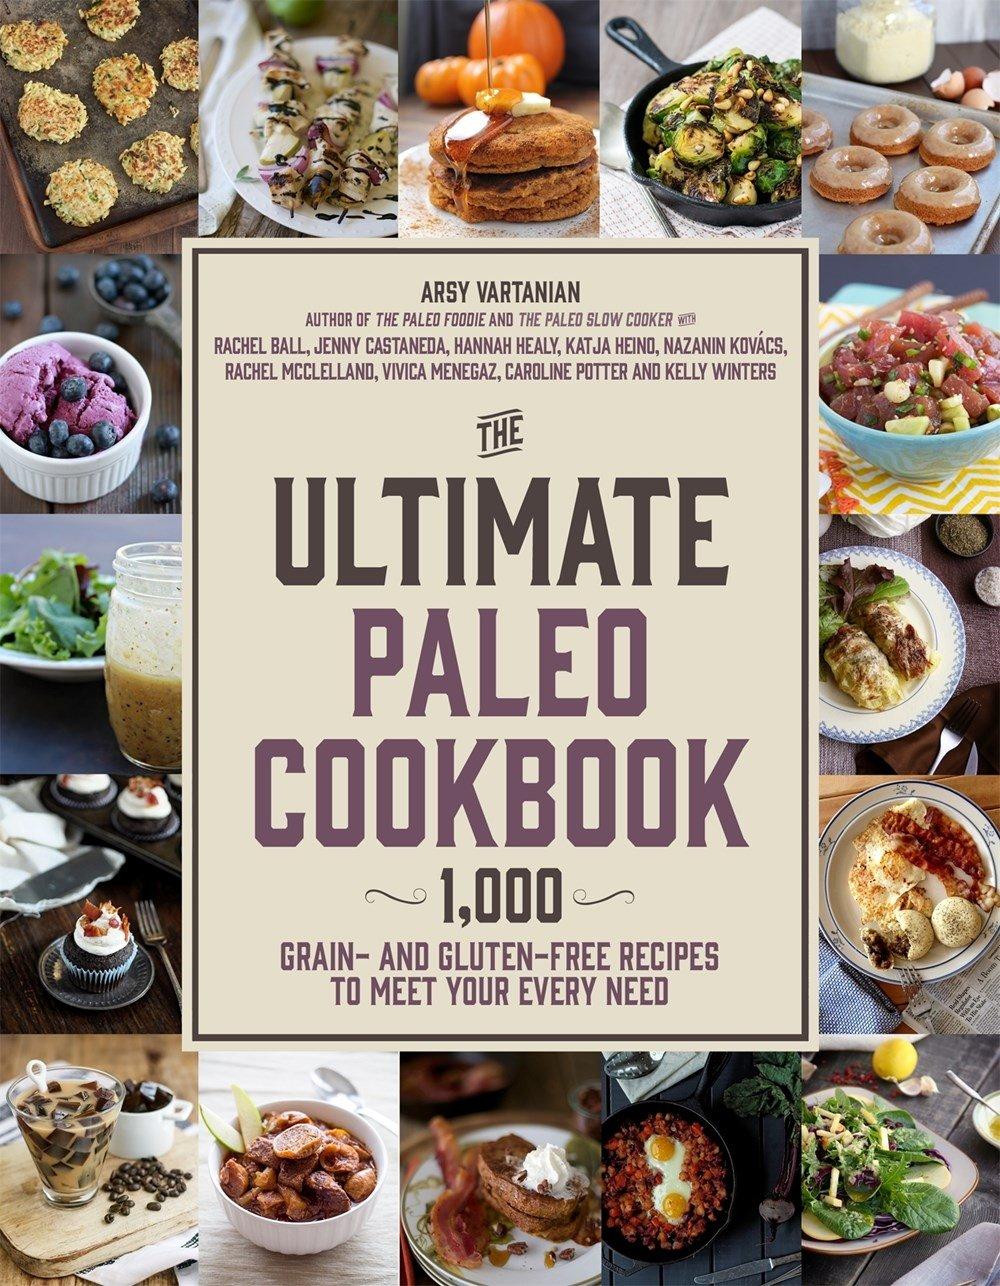 The Ultimate Paleo Cookbook: 900 Grain- and Gluten-Free Recipes to Meet  Your Every Need: Arsy Vartanian, Caroline Potter, Rachel McClelland, Katja  Heino, ...